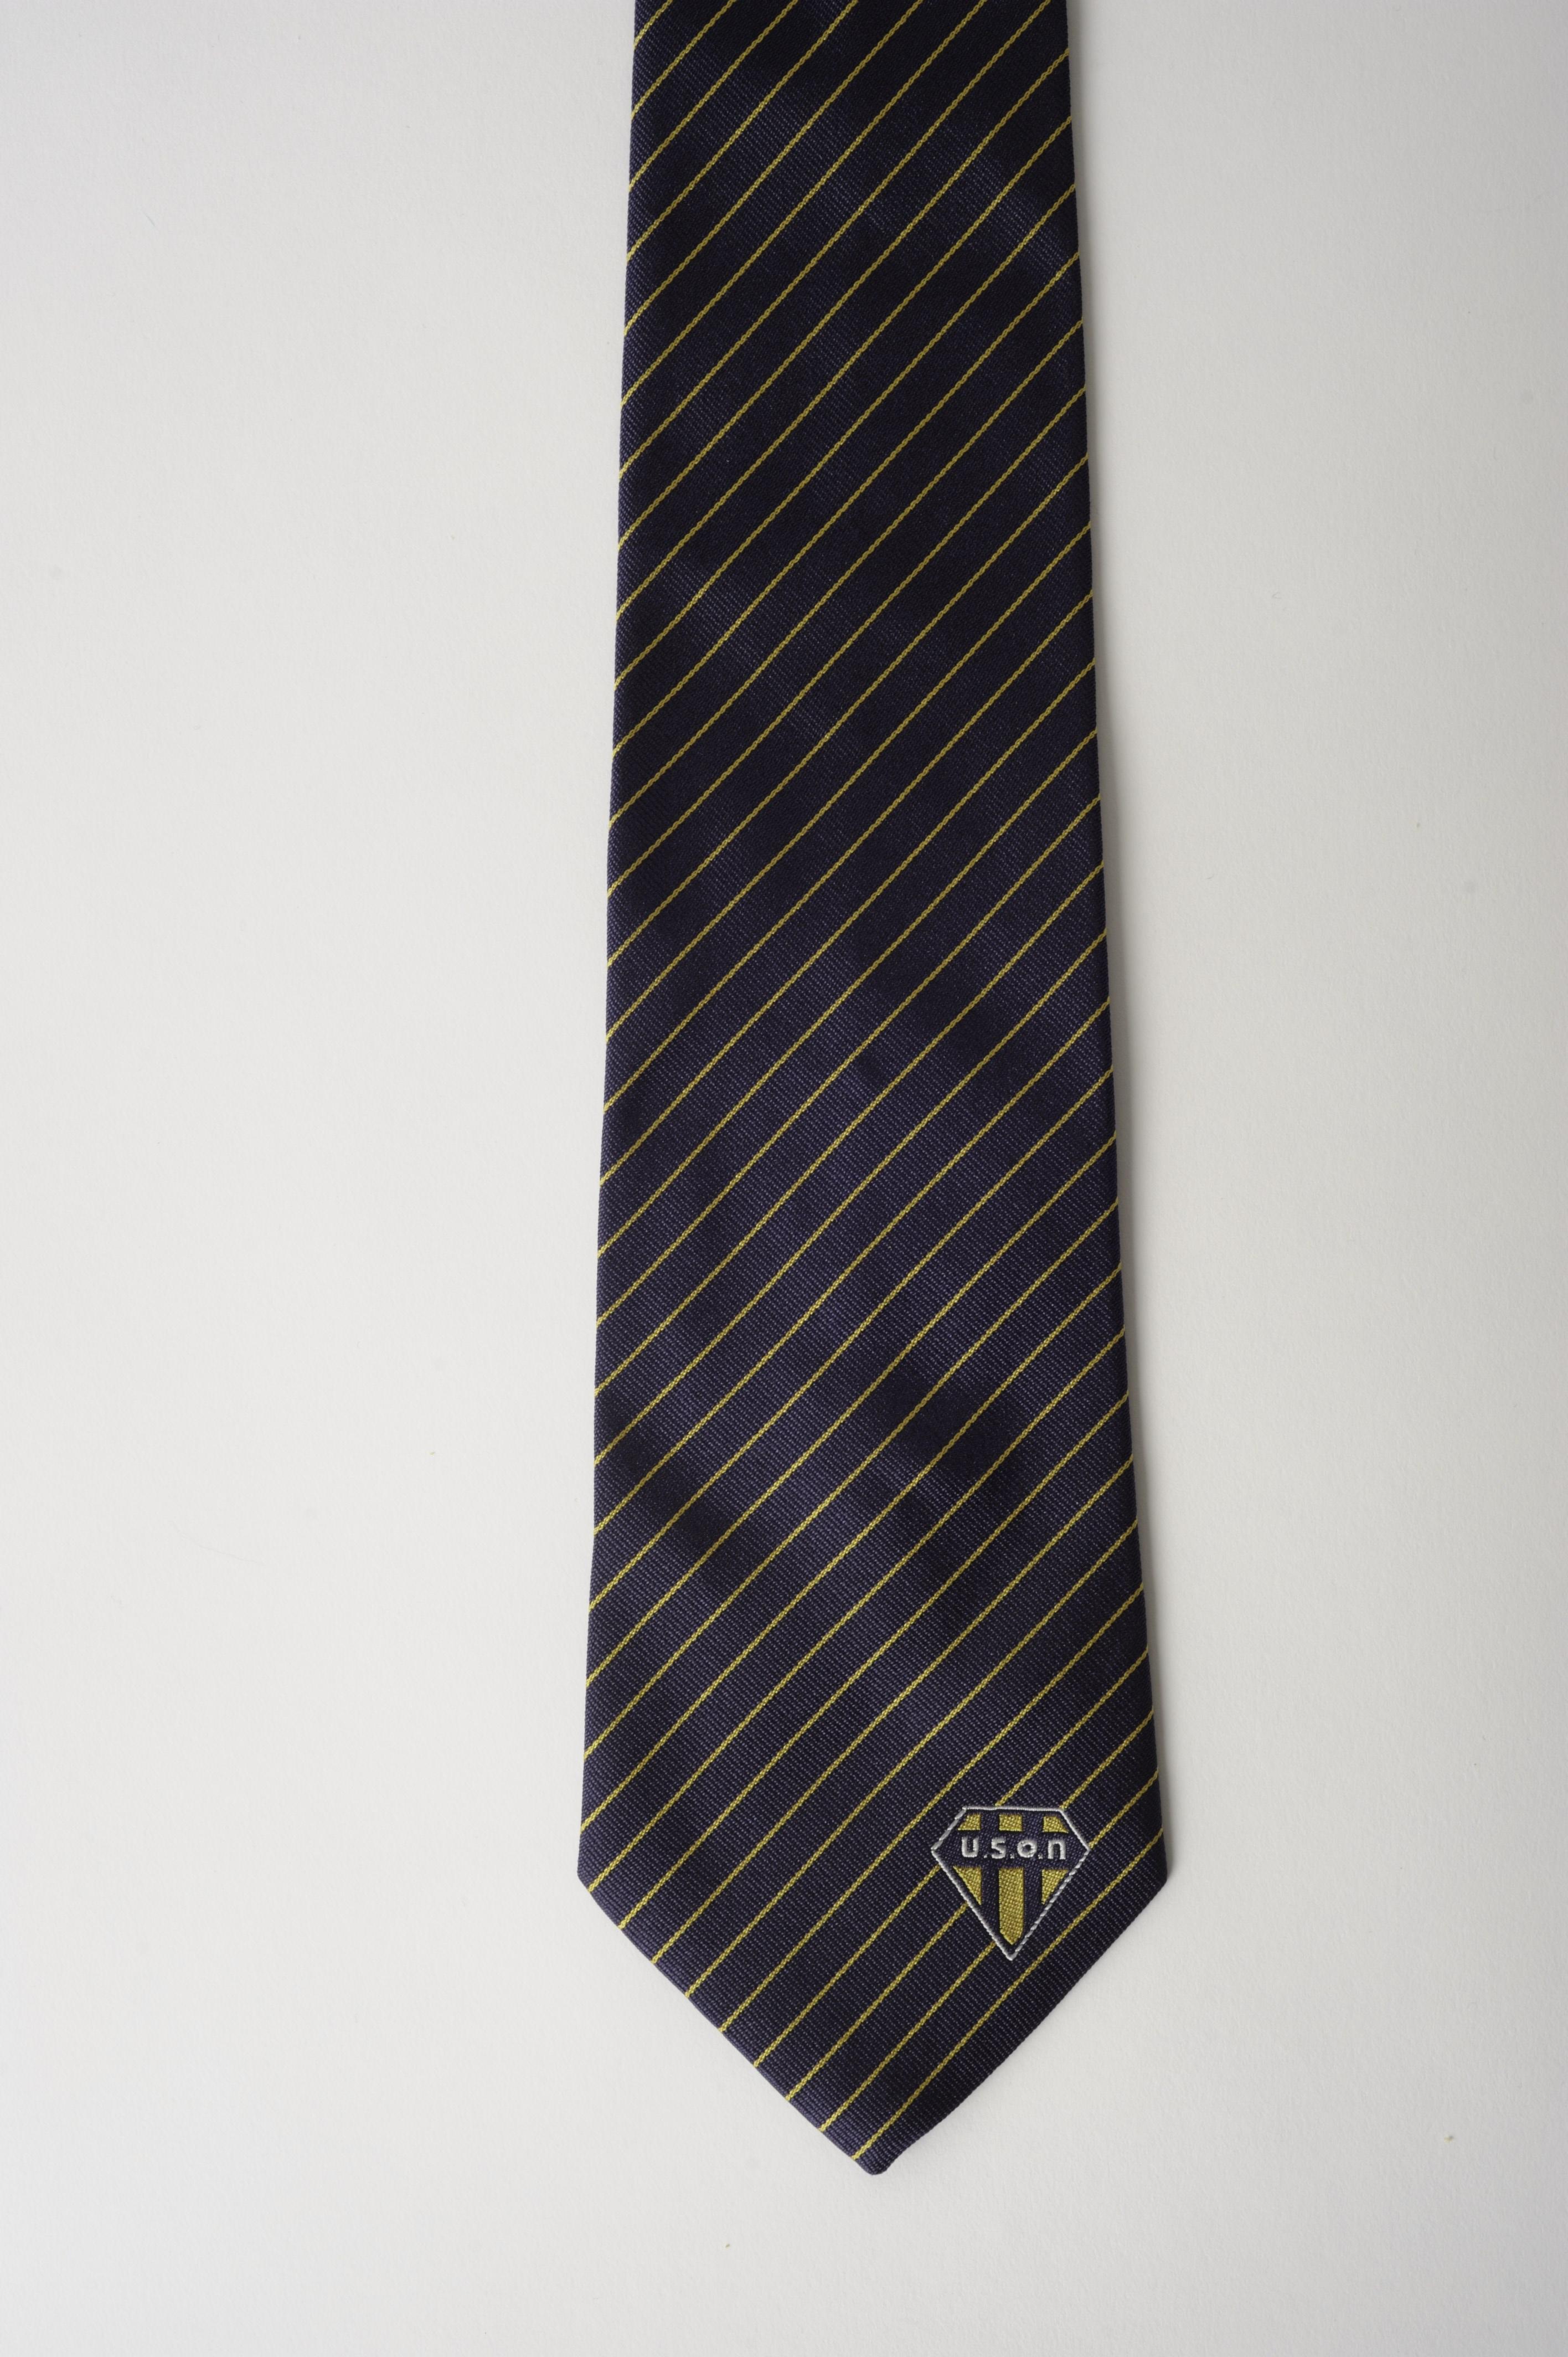 Cravate Tissée Jacquard